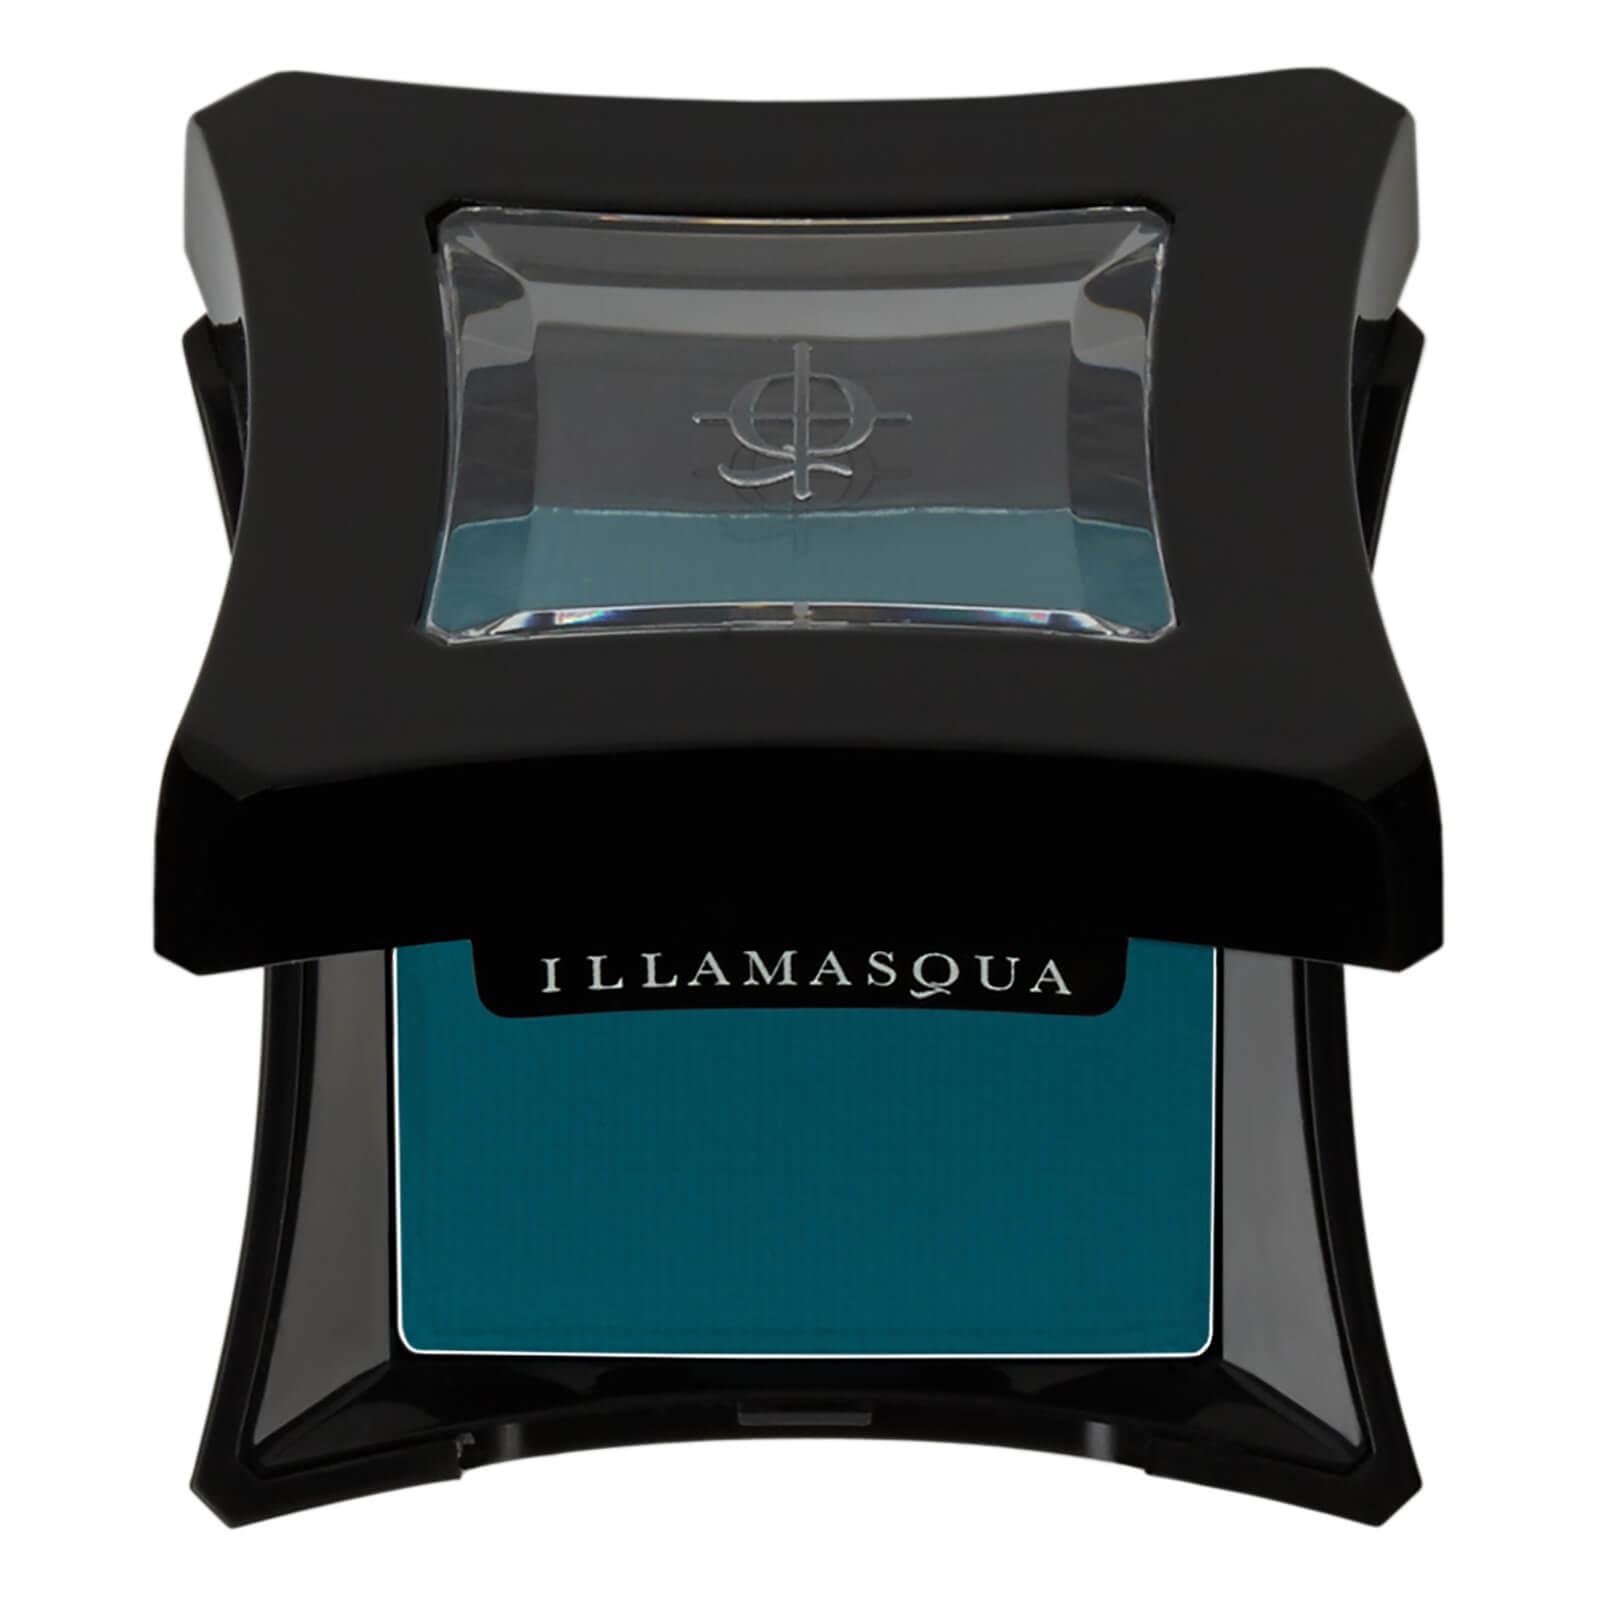 Illamasqua Powder Eye Shadow 2g (various Shades) - Burst In Green